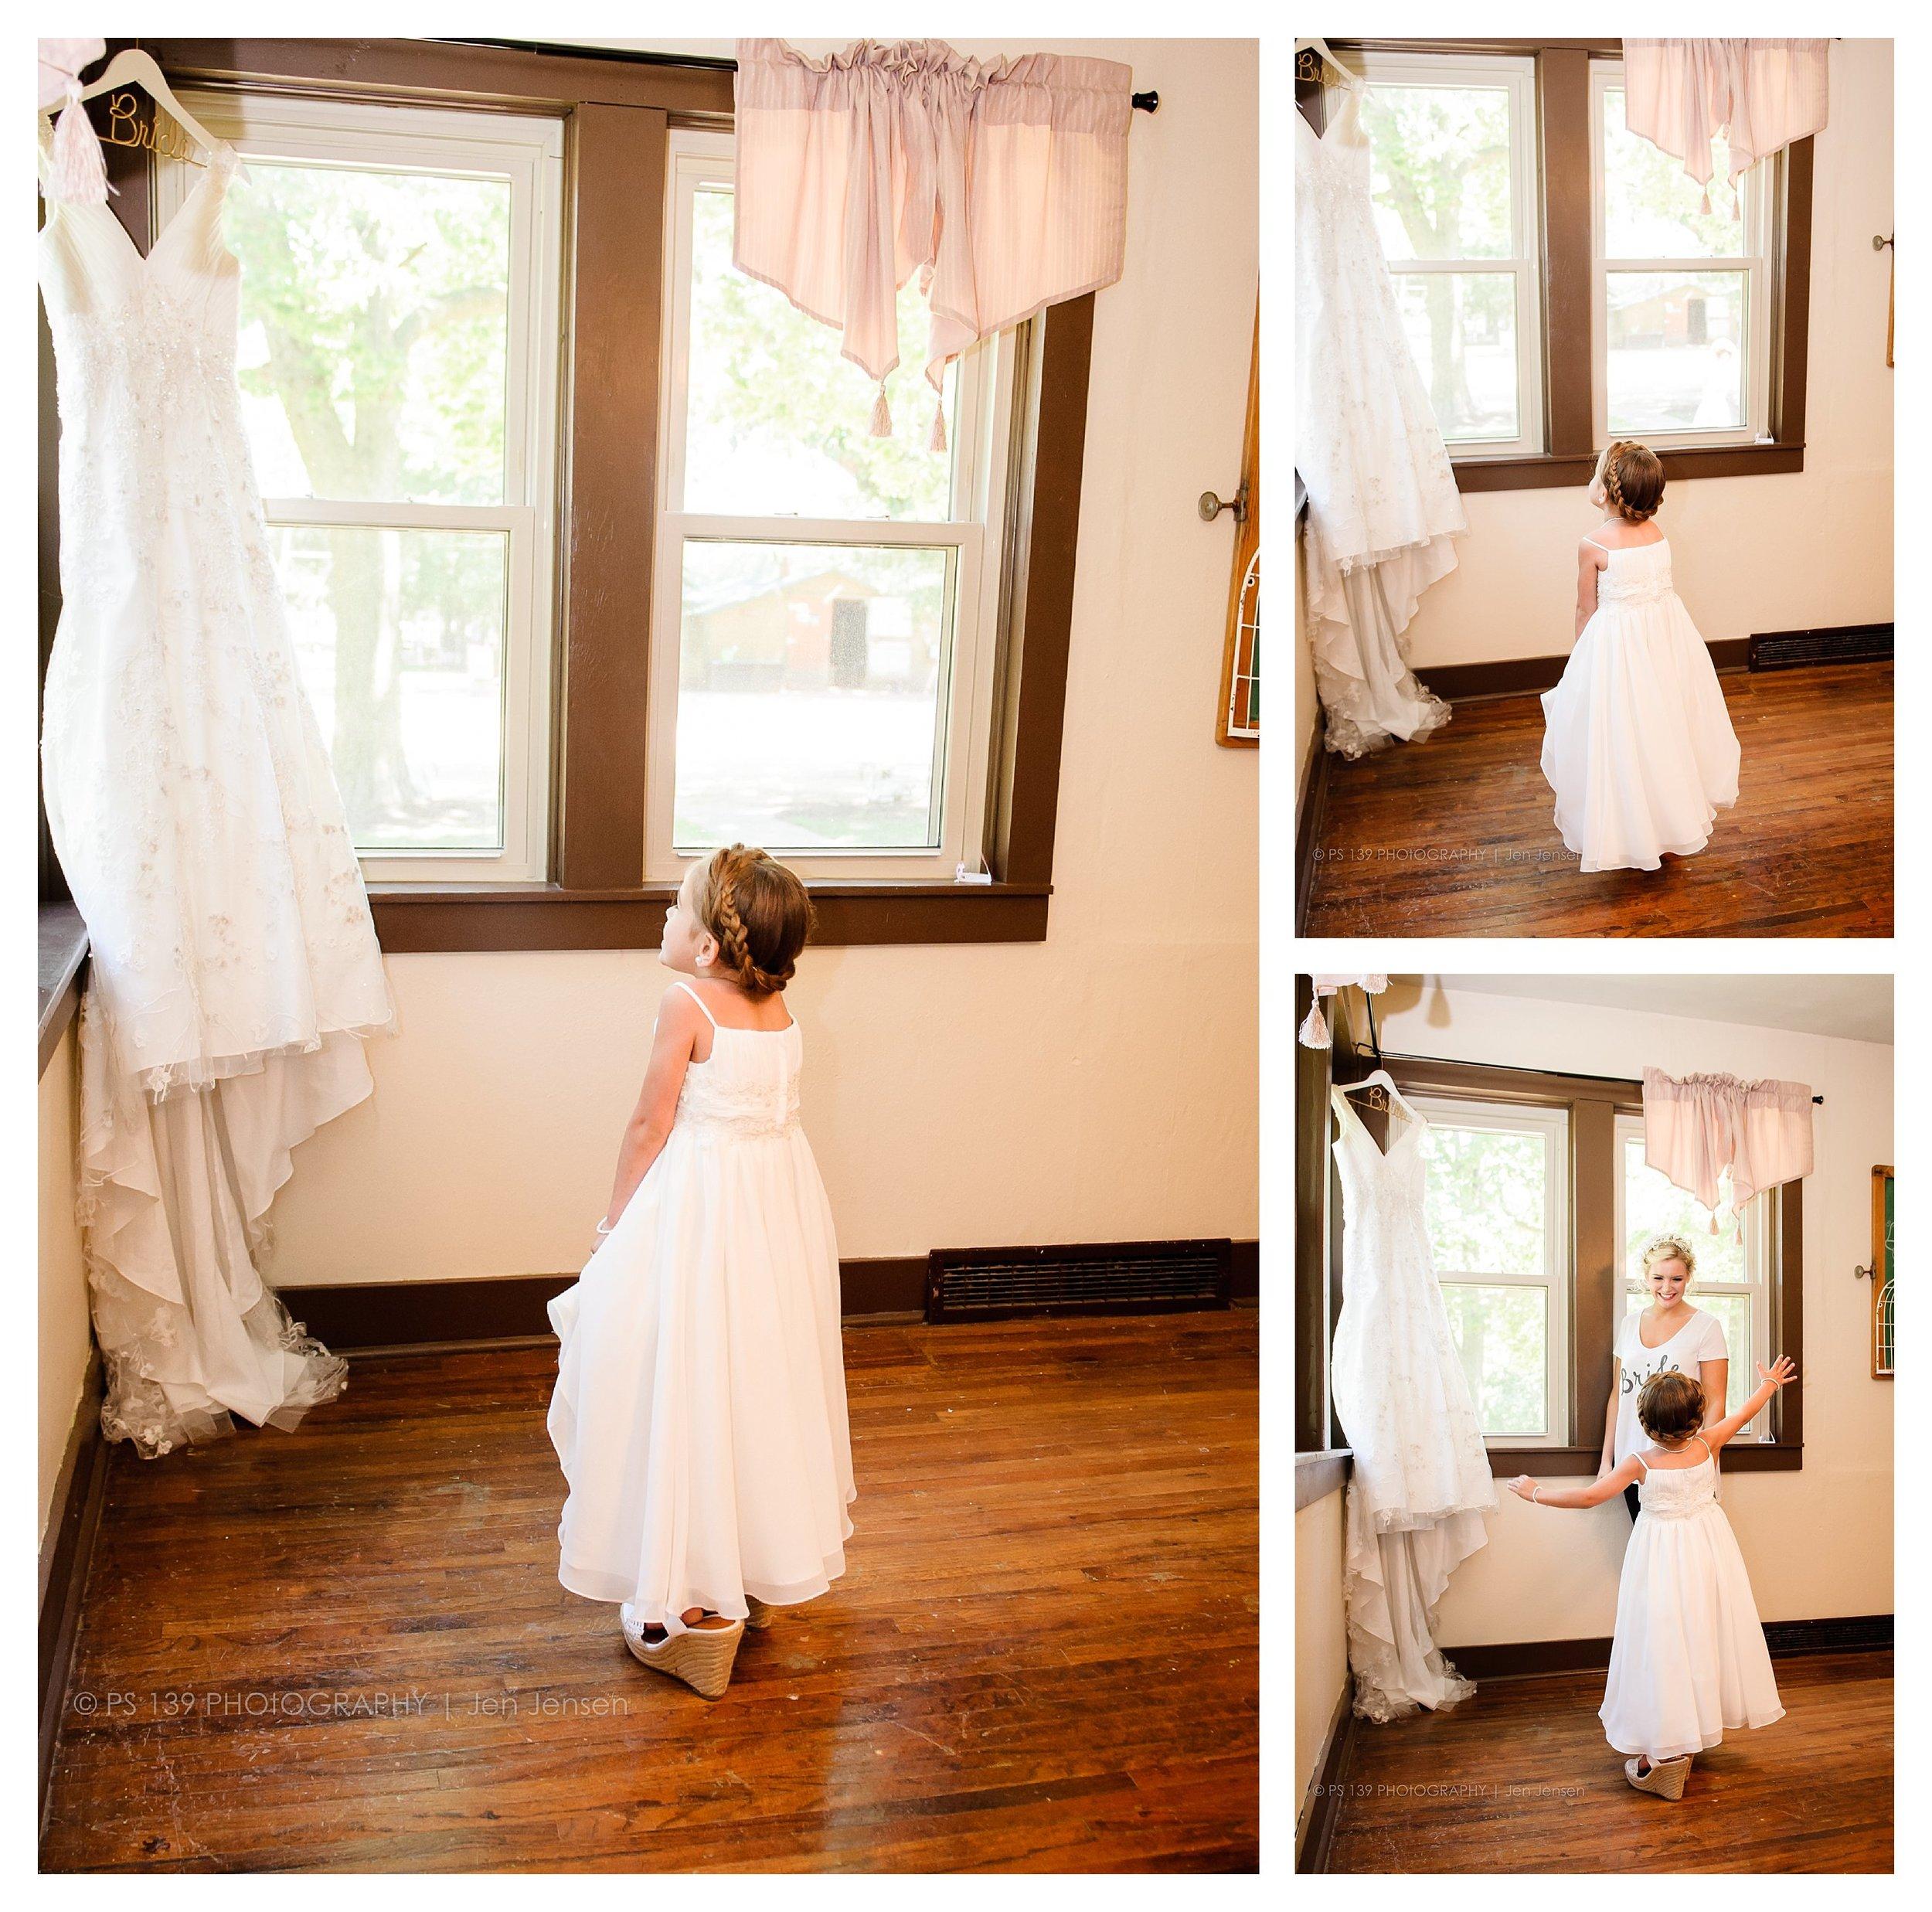 oregon Illinois oak lane farm wisconsin wedding photographer bayfield wi ps 139 photography jen jensen_0240.jpg